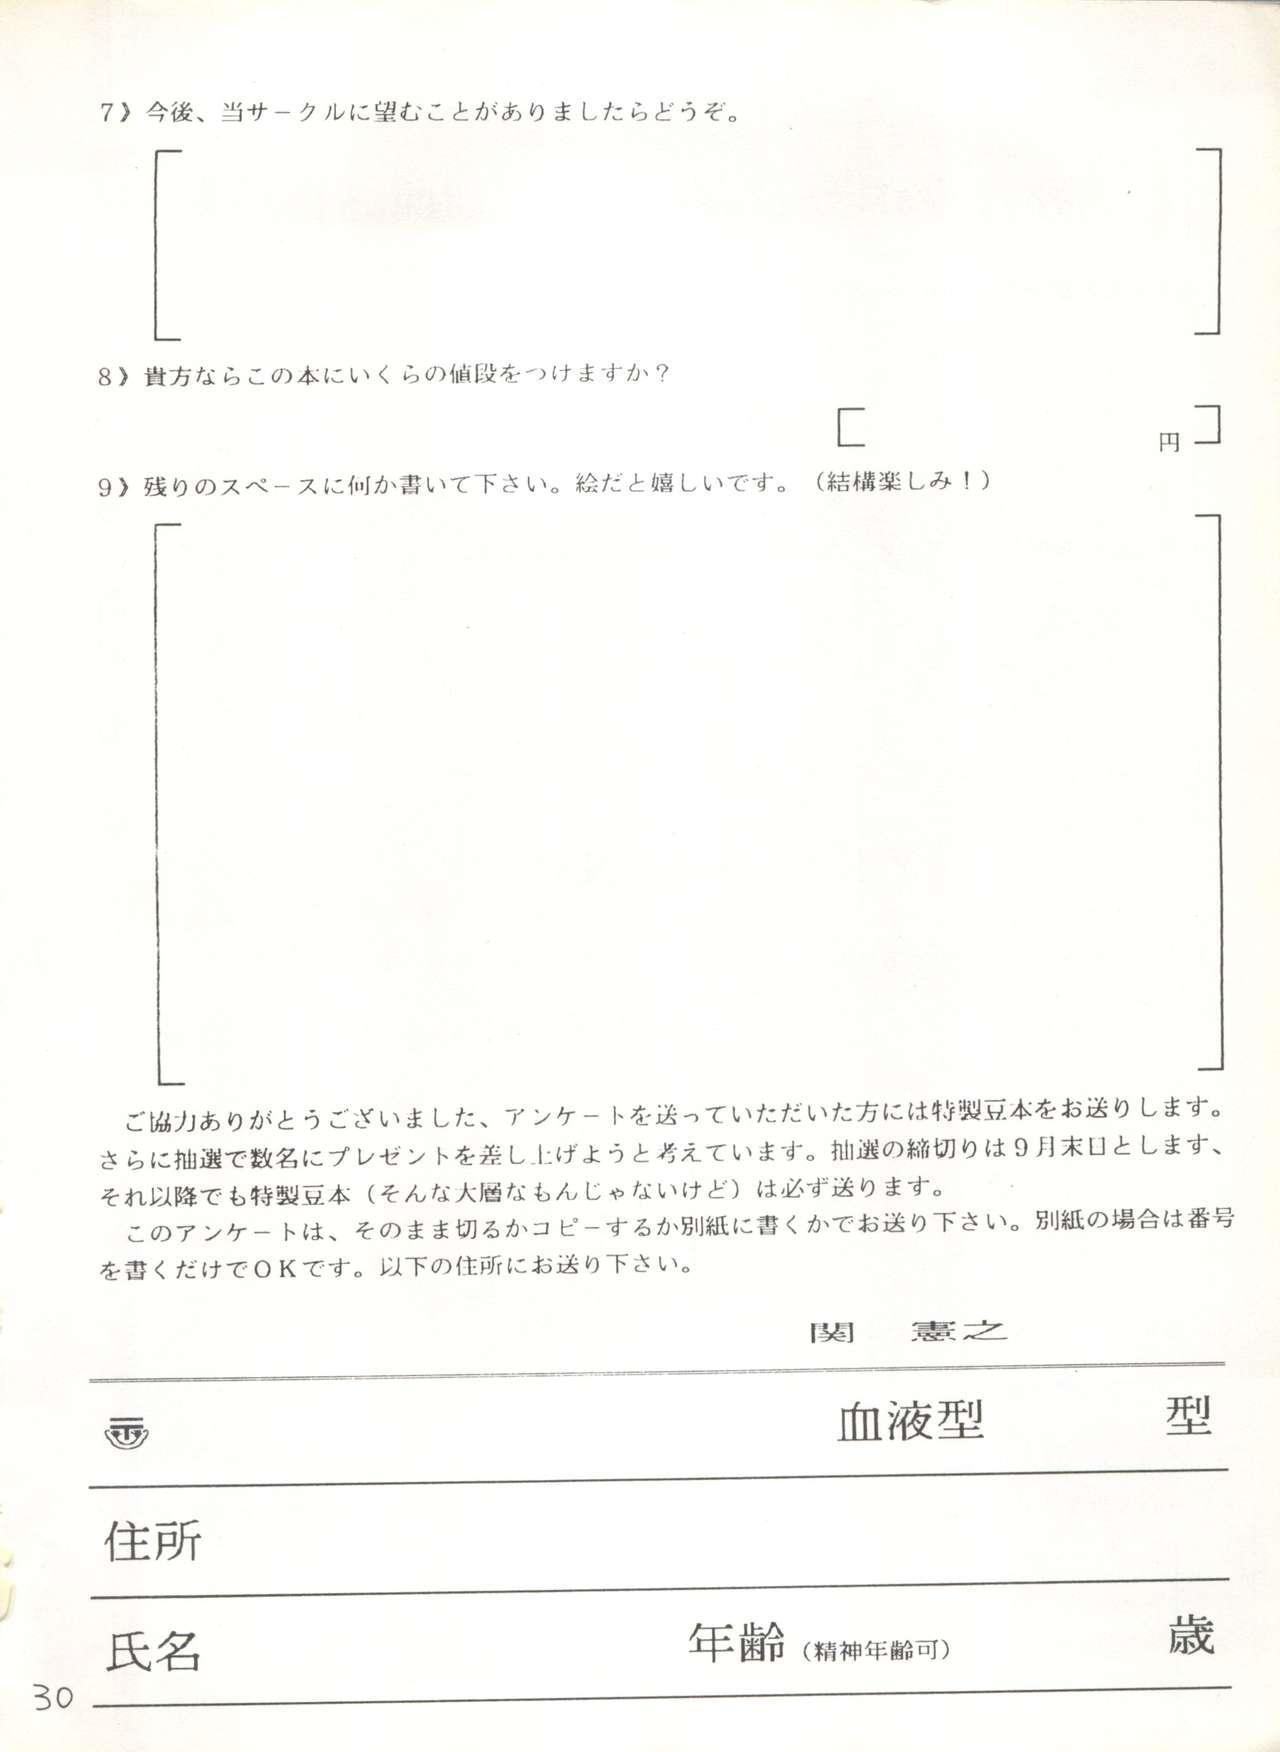 [Global One (MARO)] Sadistic 5 (Cutey Honey, Devilman, Sailor Moon), [Global One (MARO)] Sadistic (Dirty Pair, Fushigi no Umi no Nadia, Sailor Moon), [Studio Ikkatsumajin] .ribbon (Hime-chan's Ribbon) 153